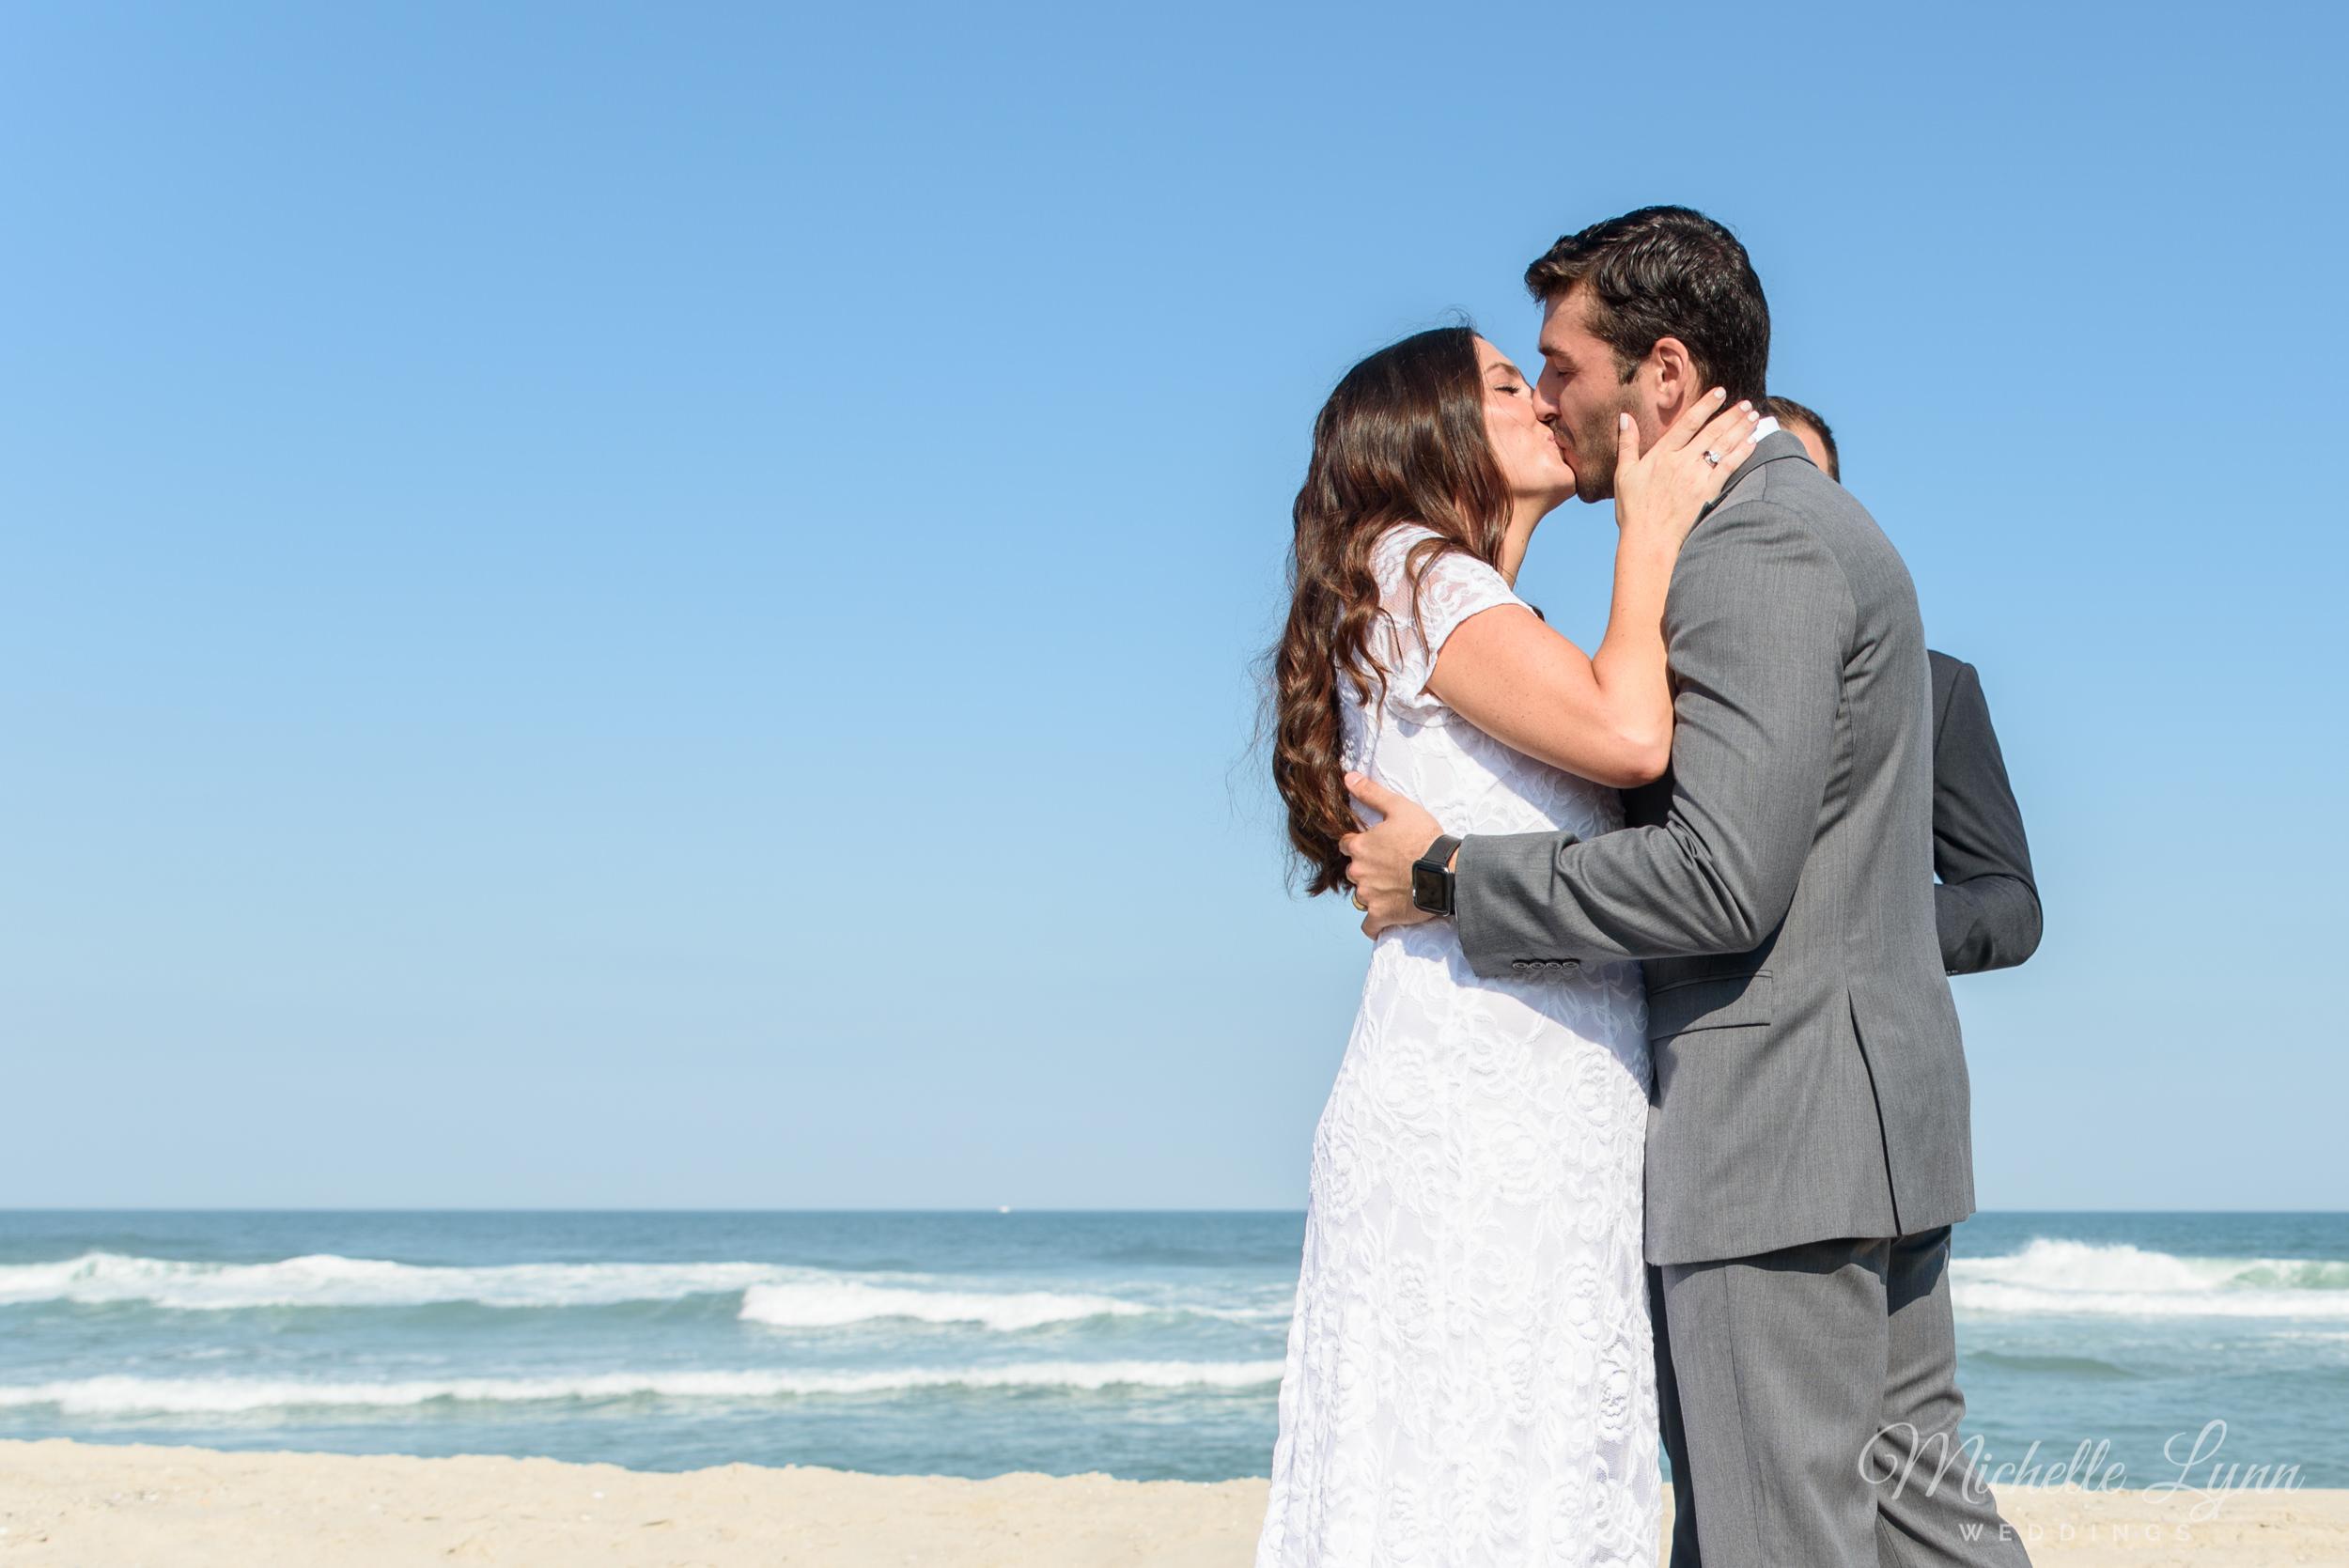 mlw-brant-beach-lbi-wedding-photography-33.jpg